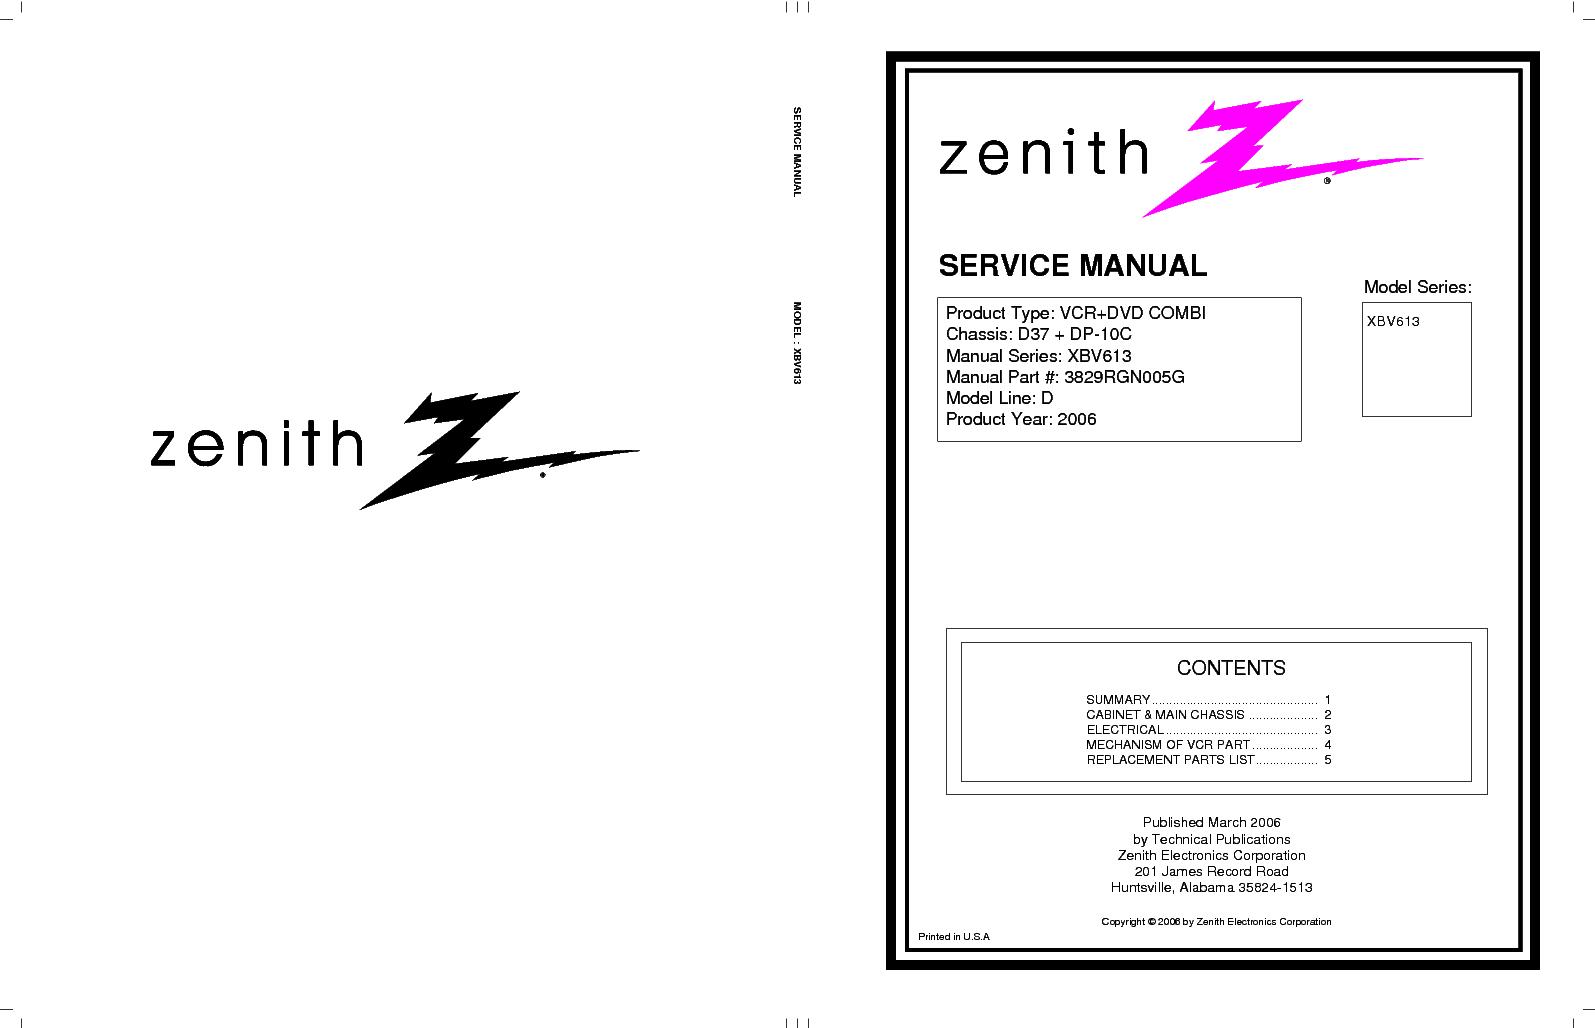 zenith xbv613 service manual download schematics eeprom repair rh elektrotanya com zenith vcr plus manual zenith dvd vcr combo manual xbr716